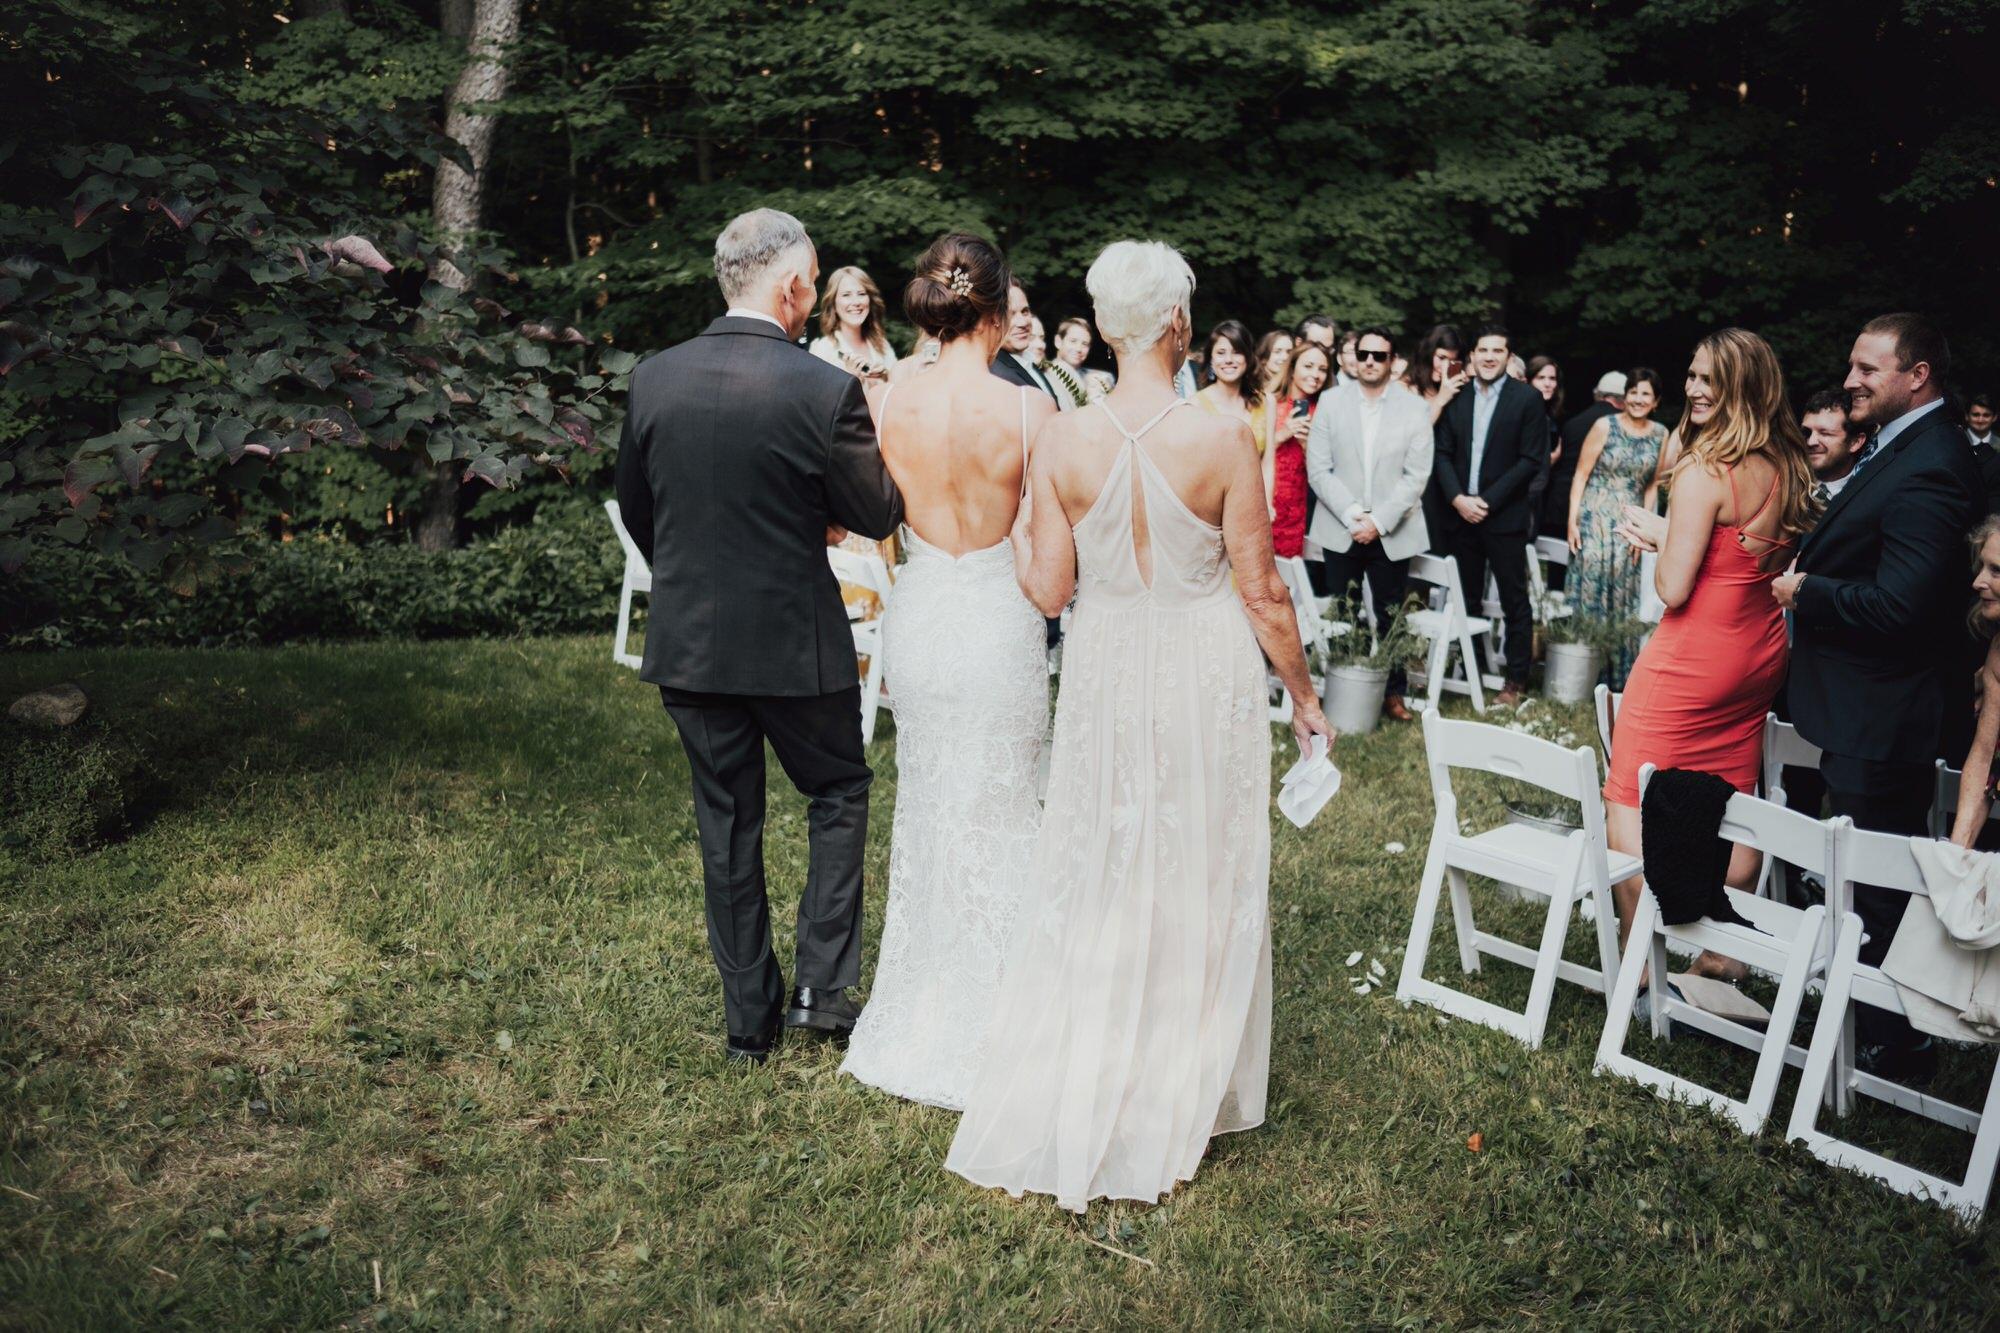 emily-aaron-rochester-new-york-wedding-photographer-147.JPG